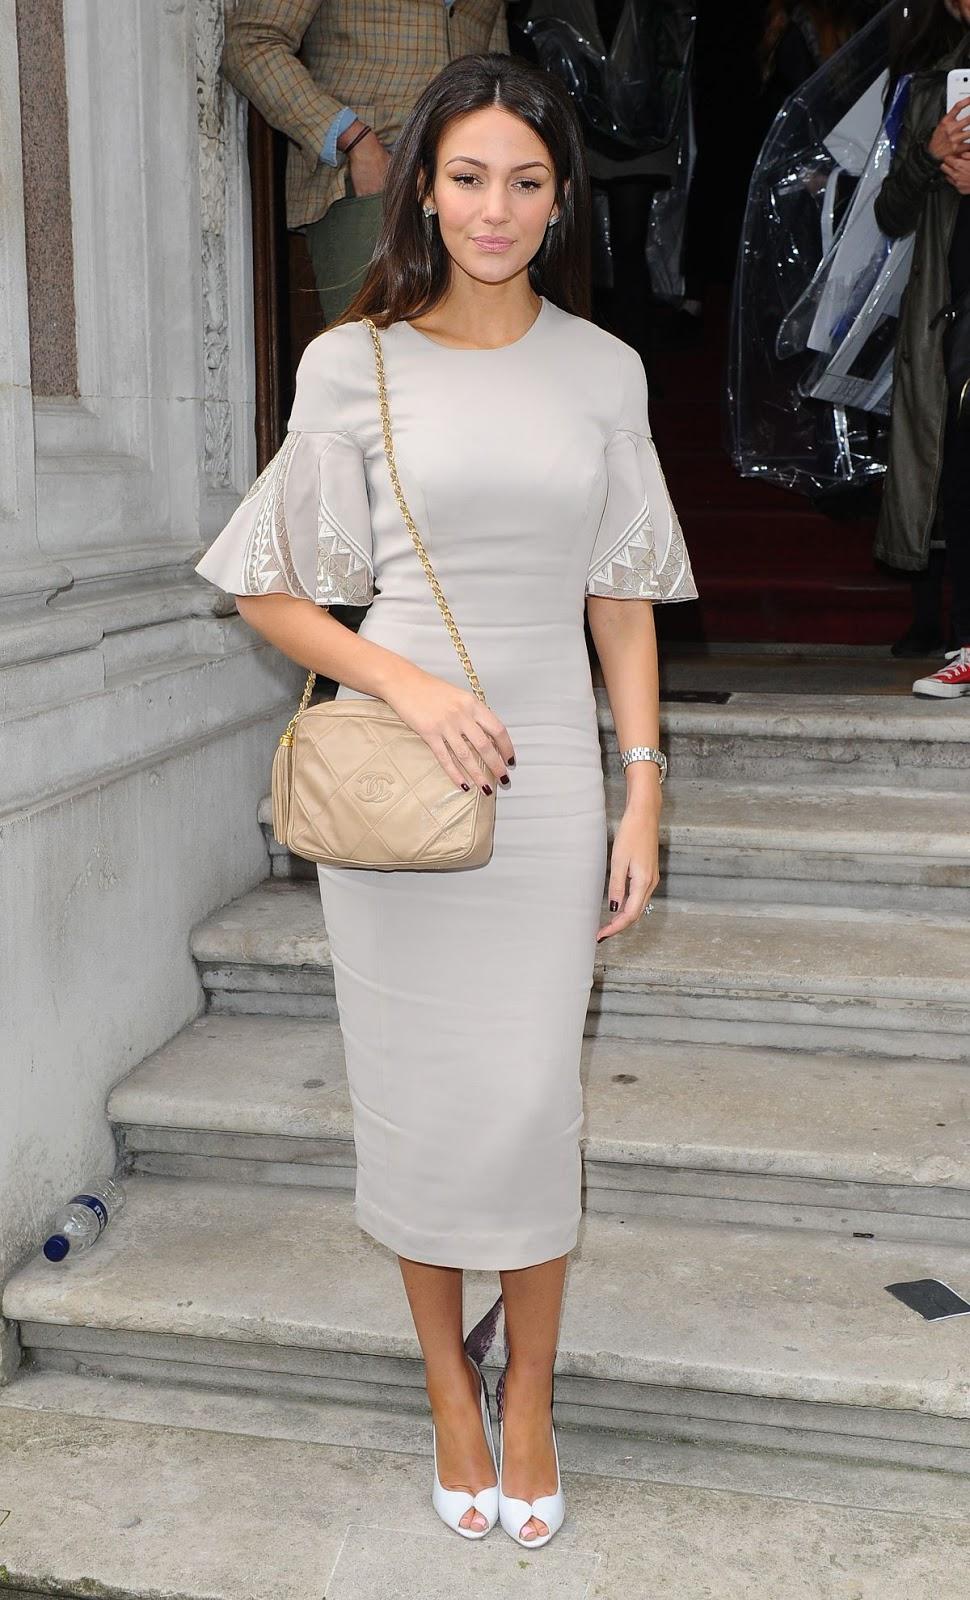 HD Photos of Michelle Keegan At Julien Macdonald Fashion Show In London